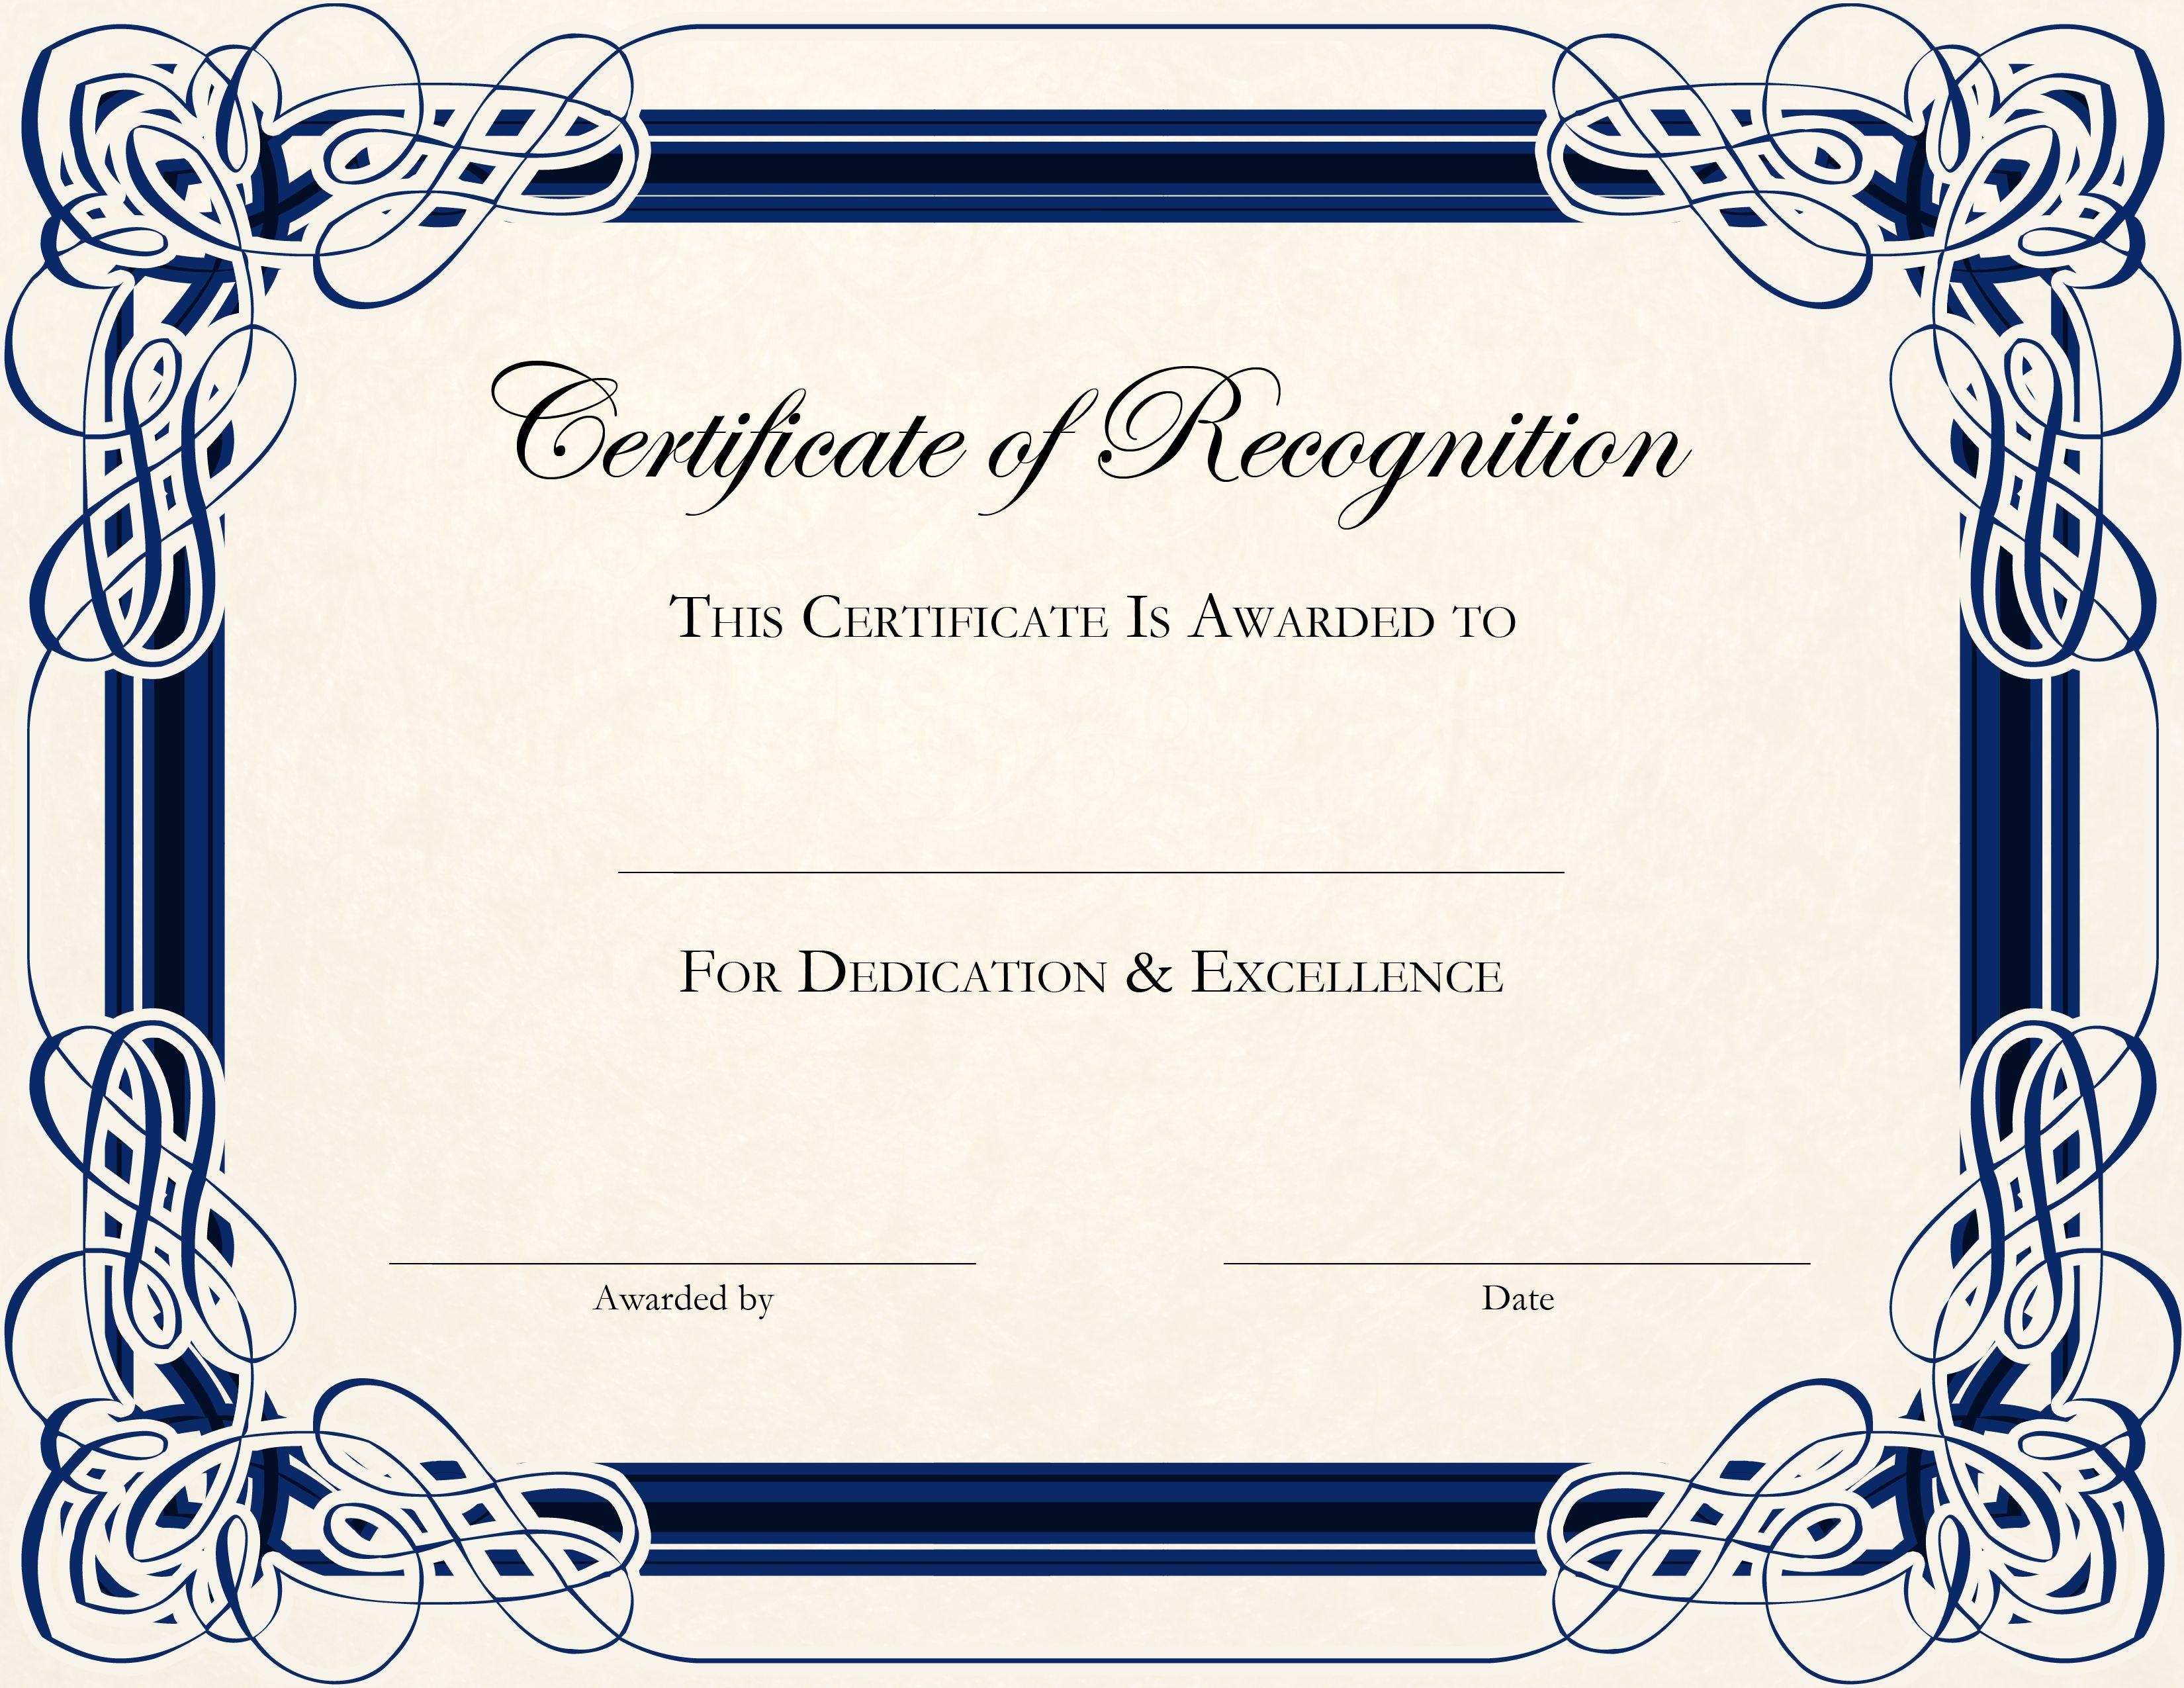 Certificatetemplatedesignsrecognitiondocs  Blankets In Certificate Of Recognition Word Template